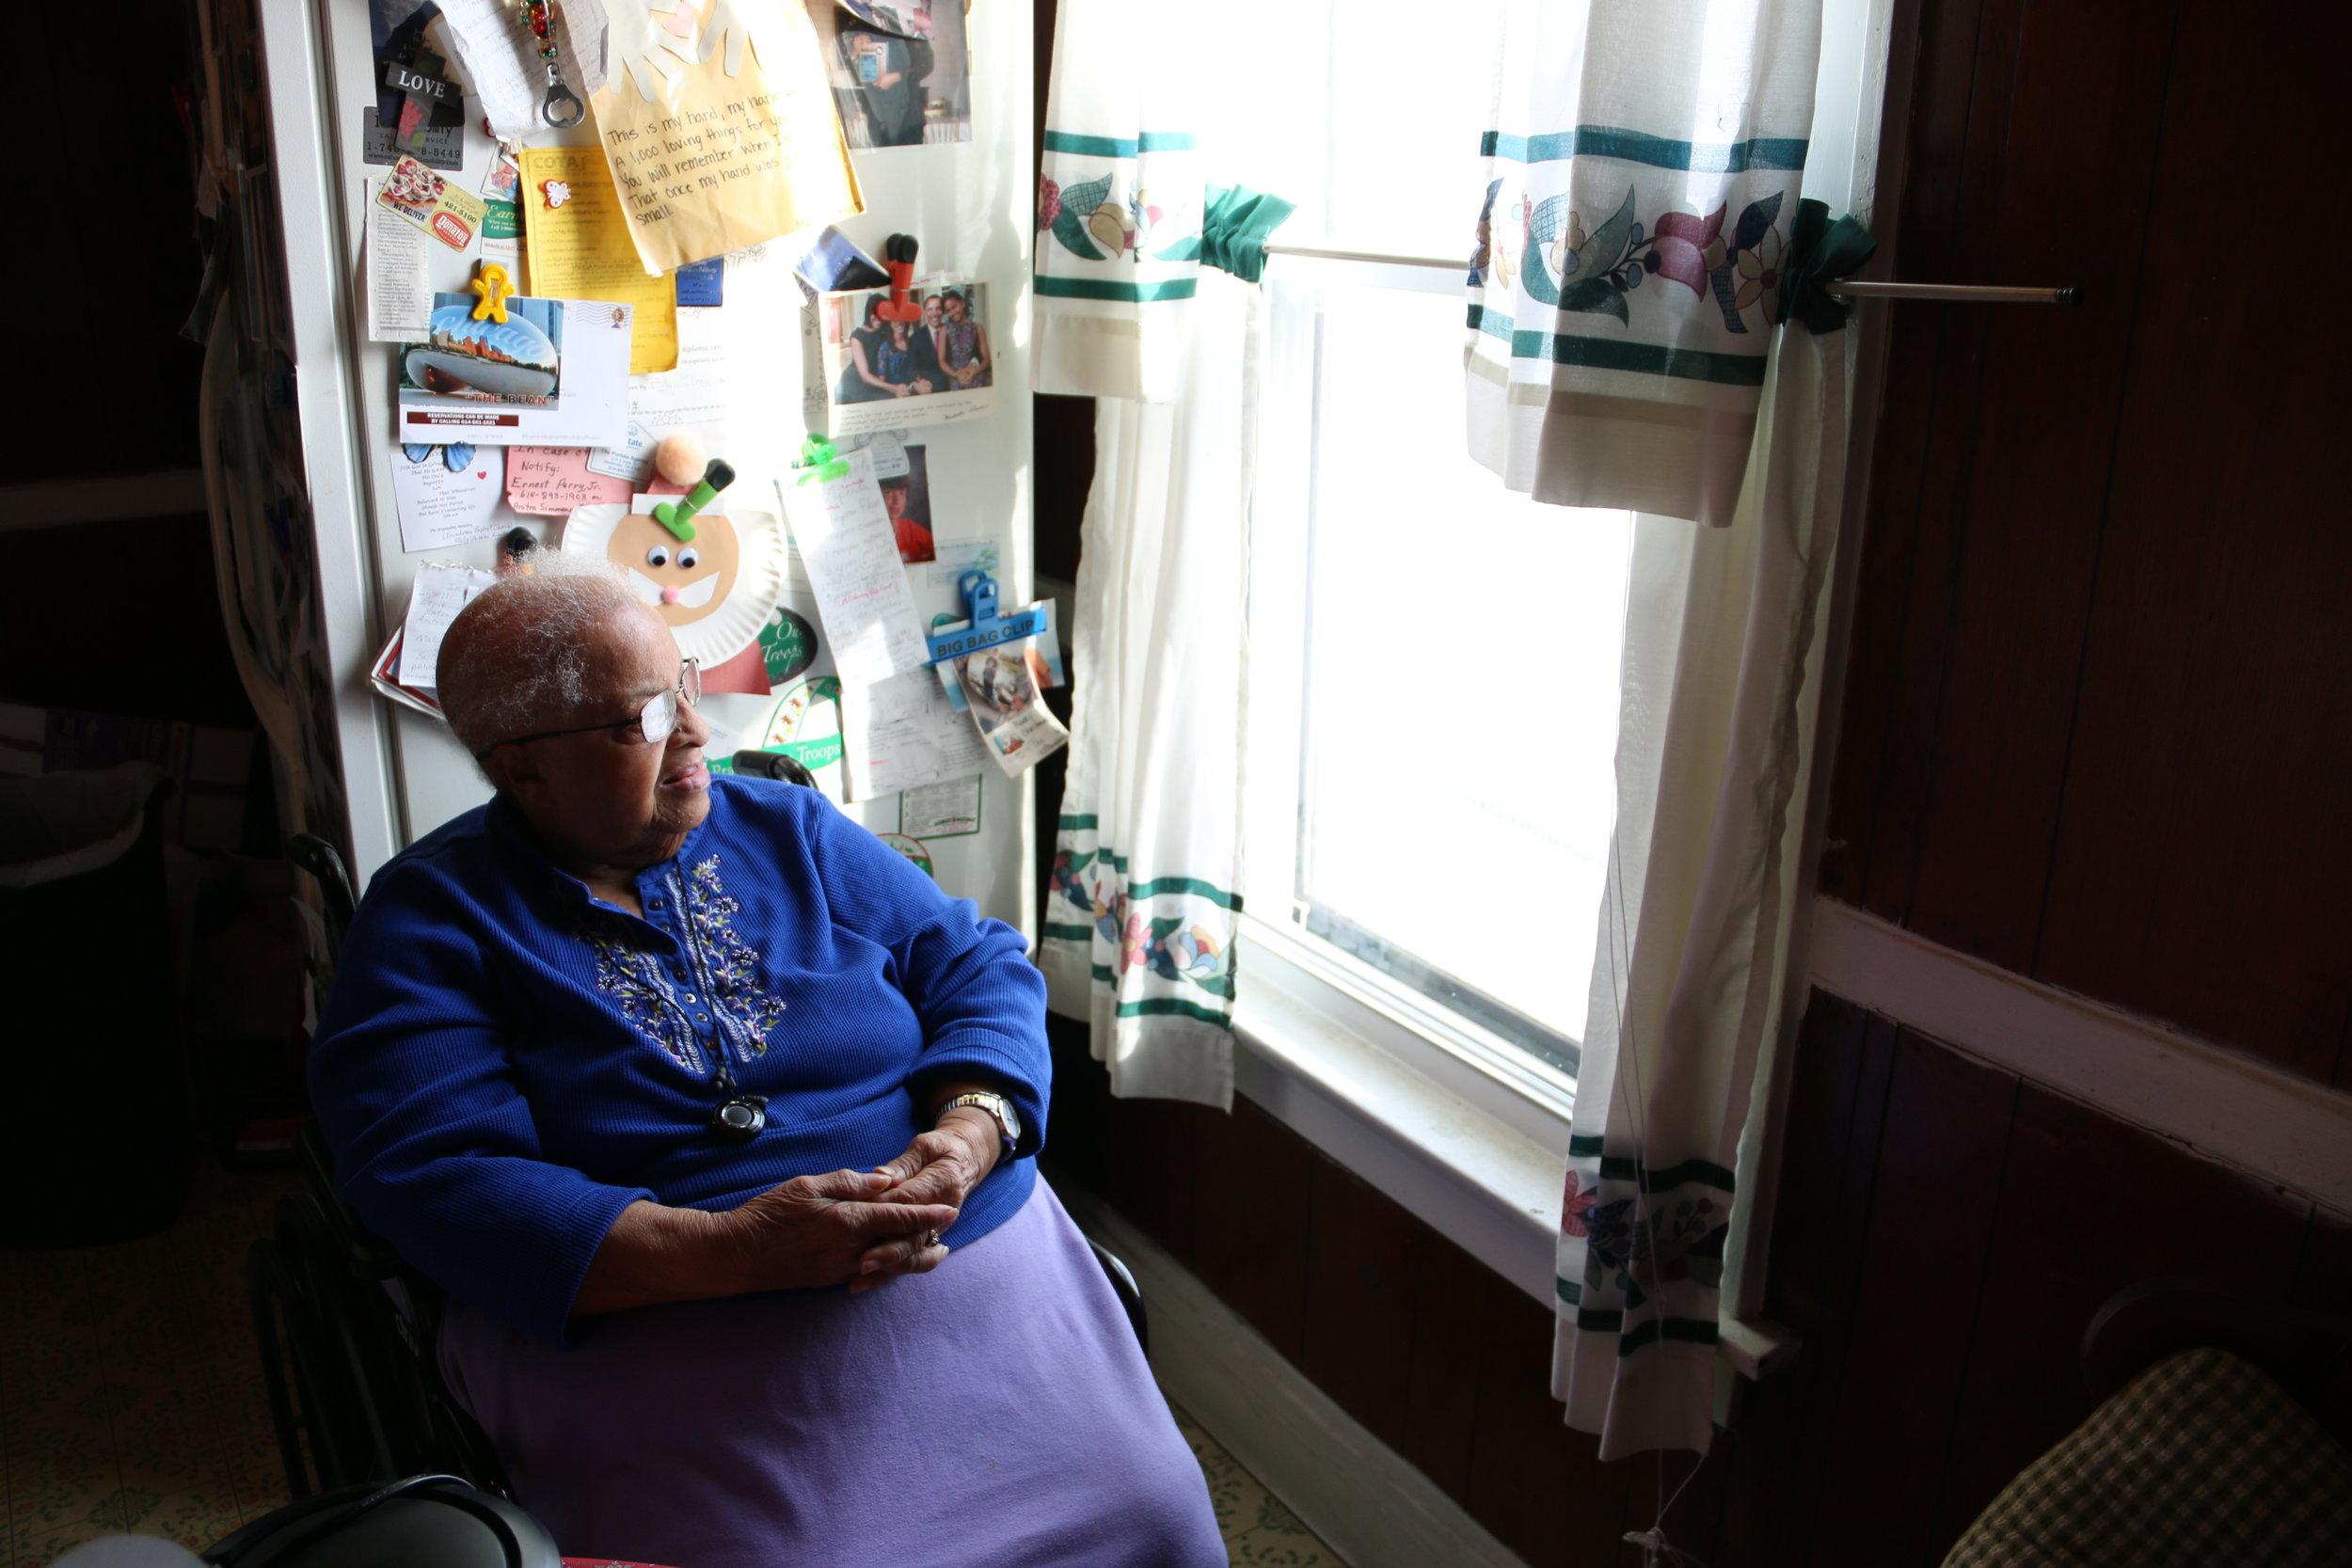 Fannie Lynch enjoys view from new kitchen window.